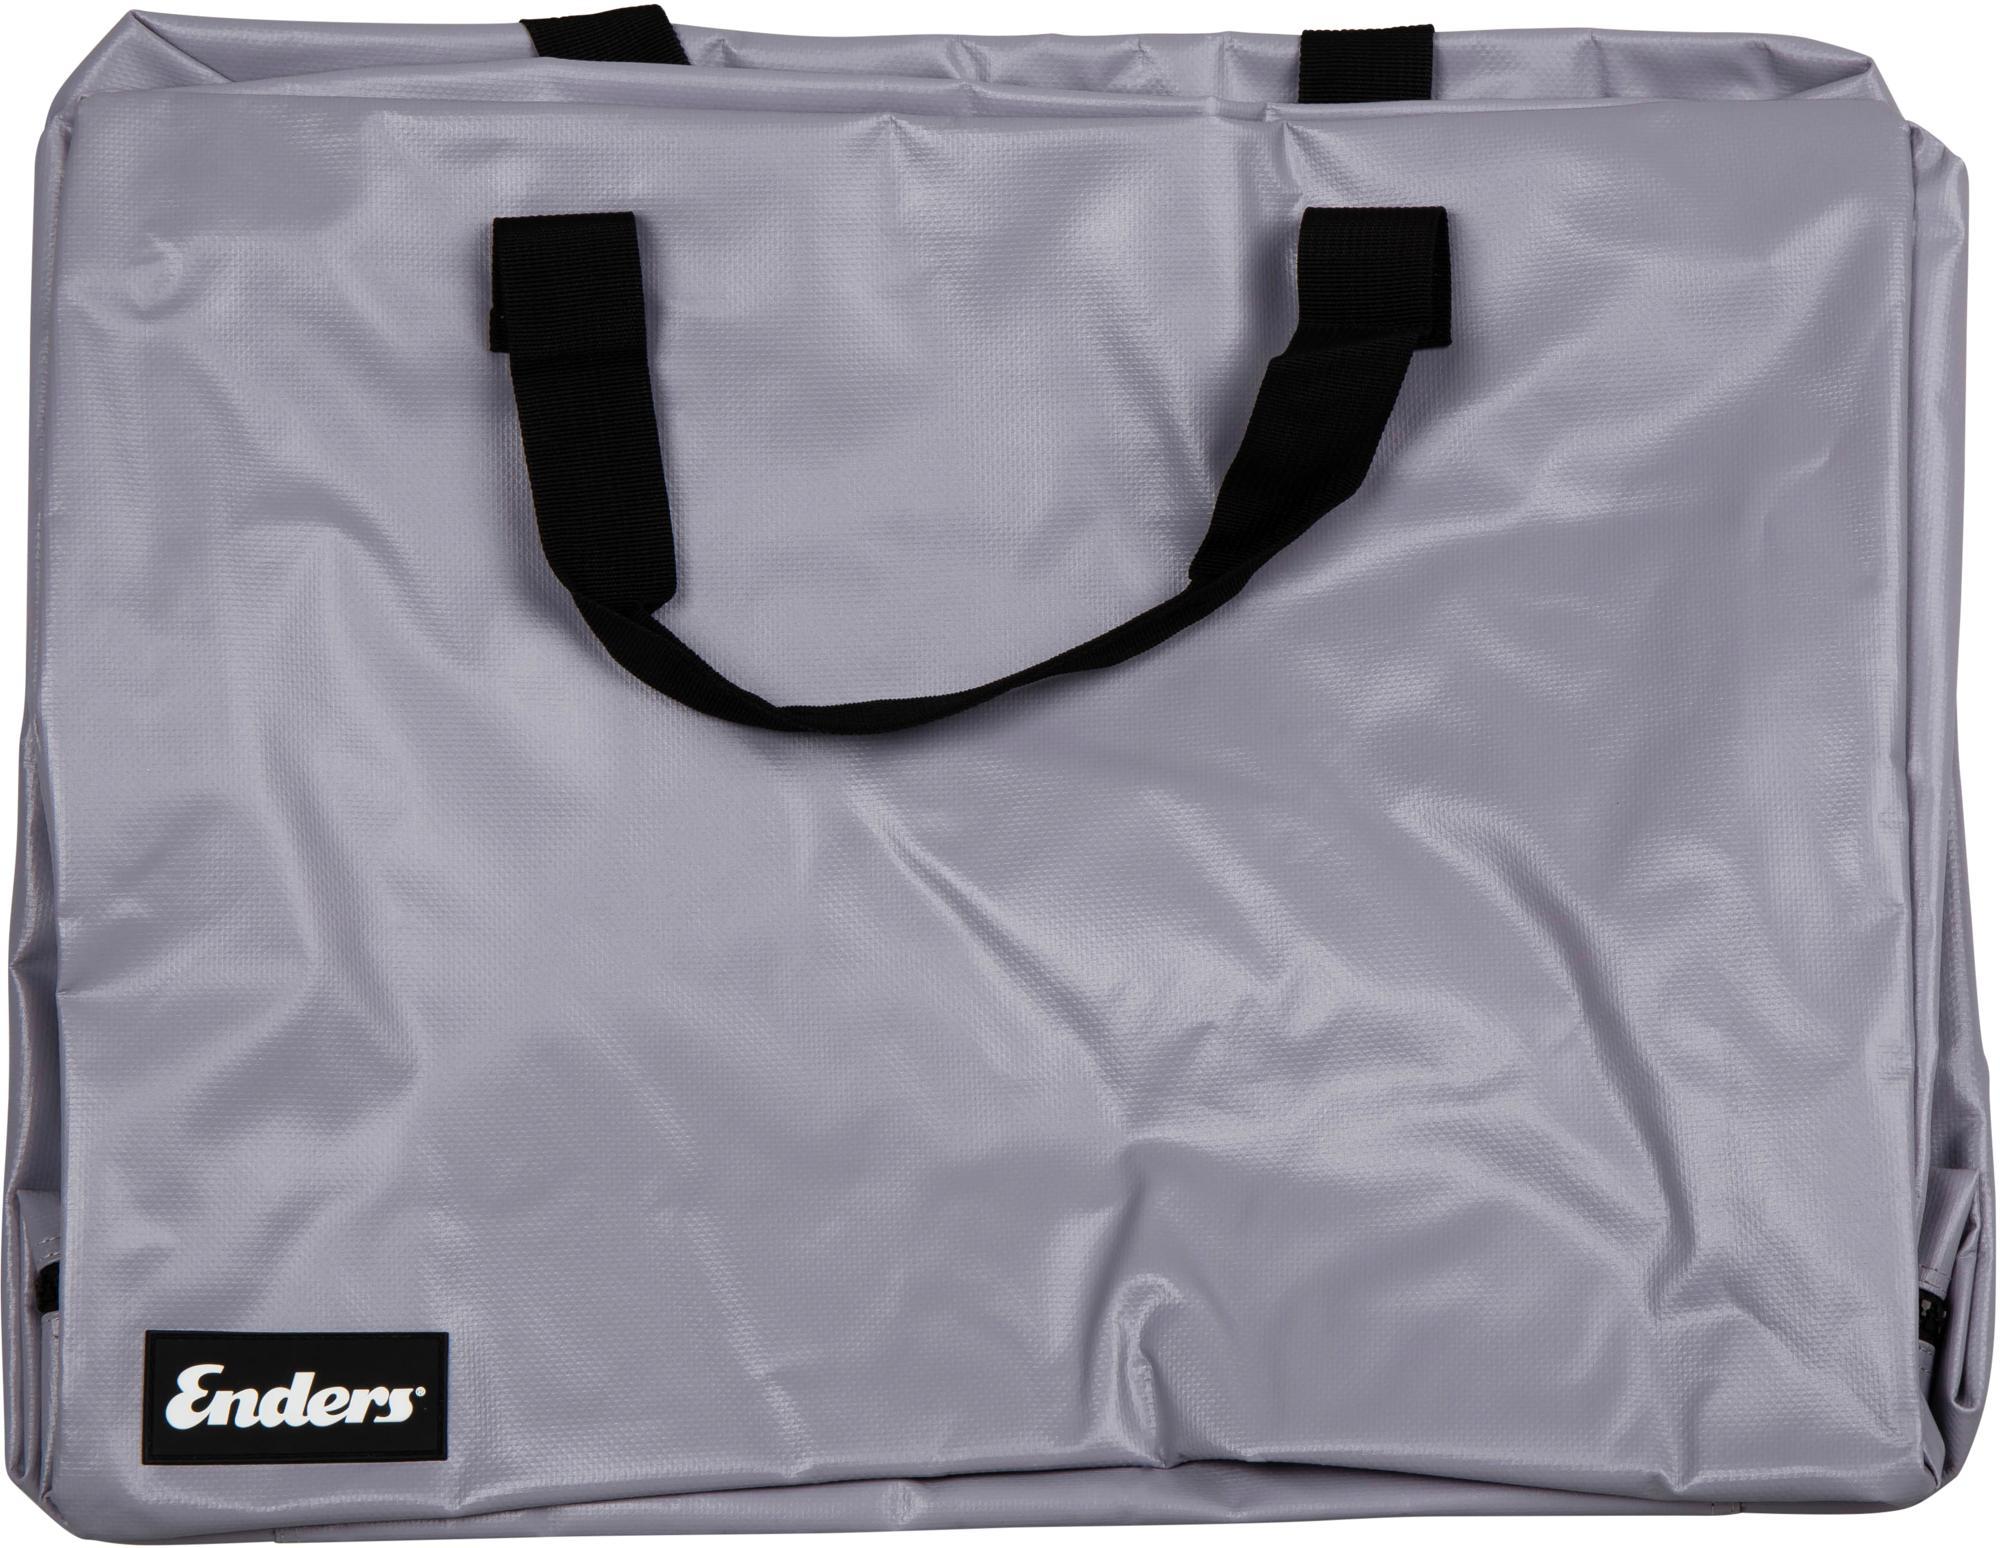 Enders Gasgrill Explorer : Enders transporttasche für campinggrill clever explorer von enders